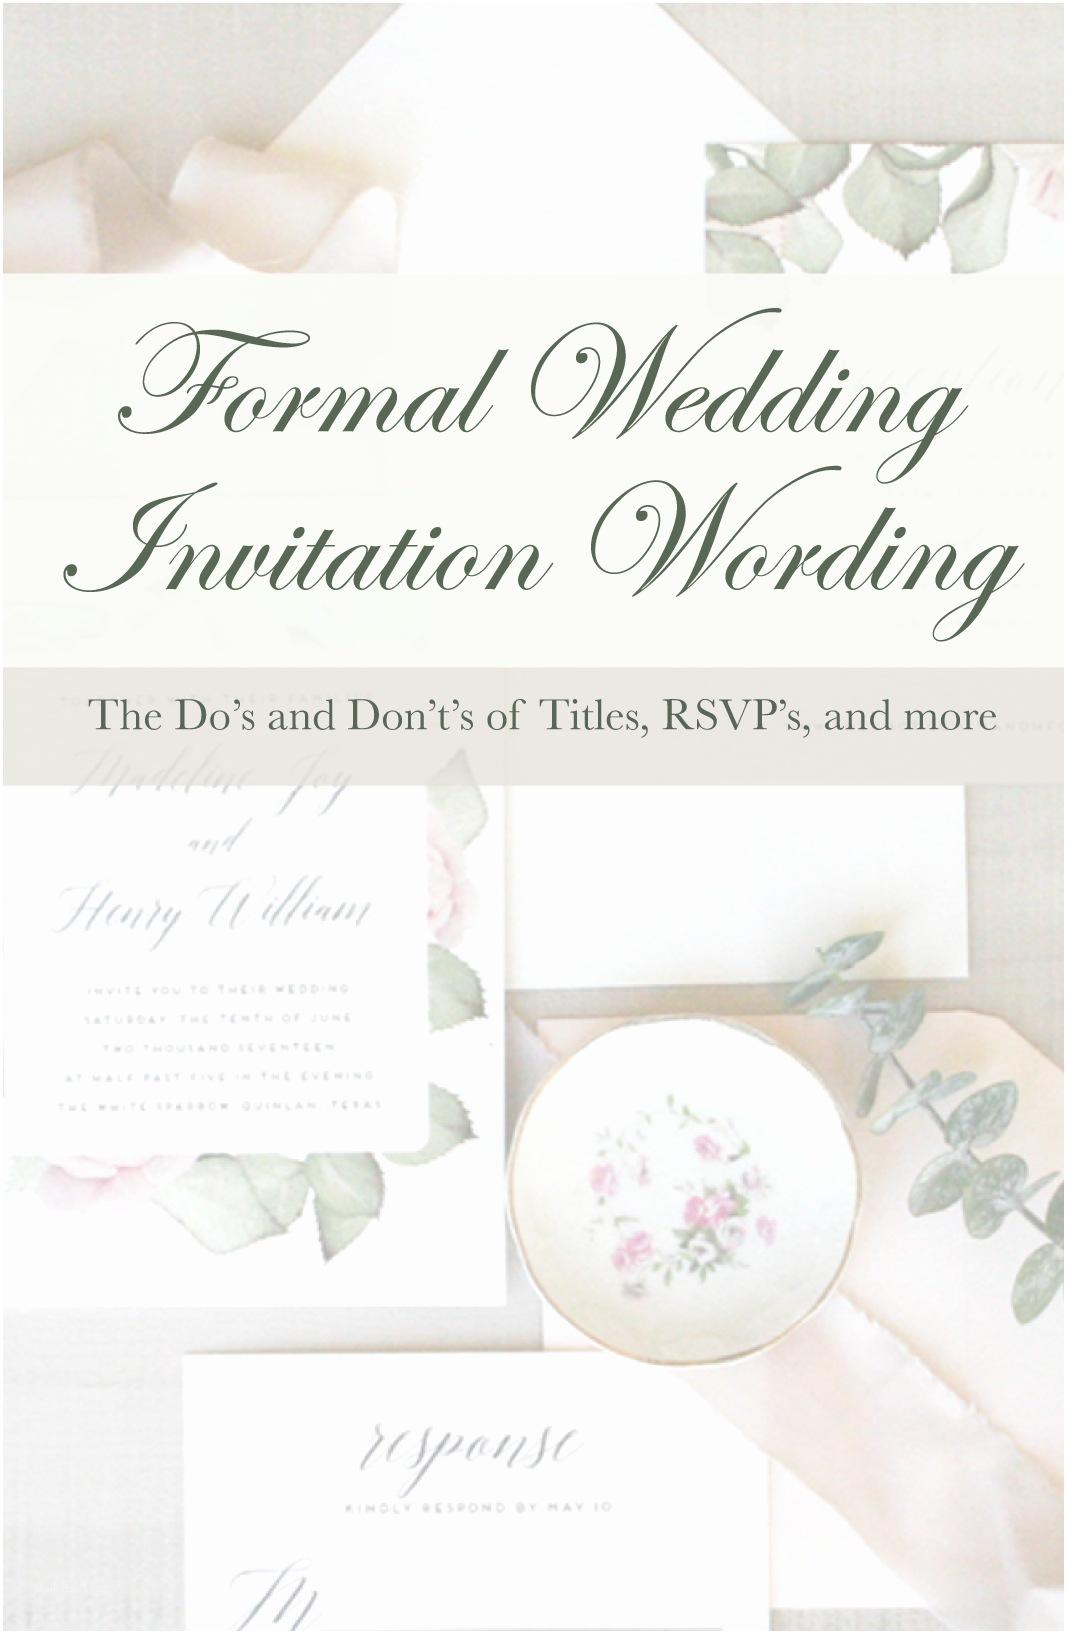 Wedding Invitation Edicate Quick Guide to Wedding Invitation Wording Etiquette Pink